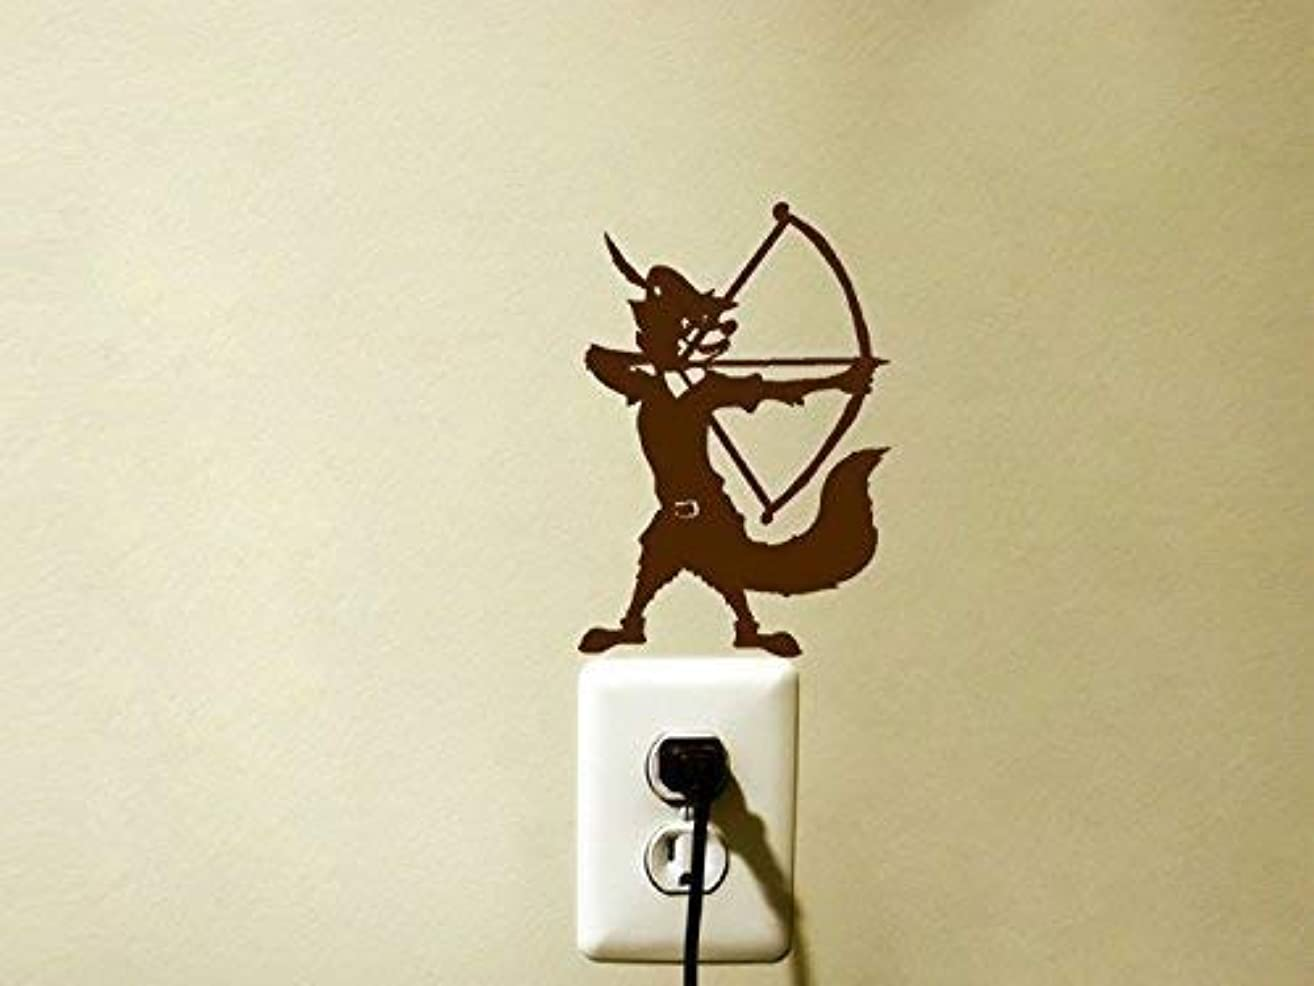 Fox Archery Vinyl Decal Sticker Bow and Arrow Kids Room Light Switch Decor